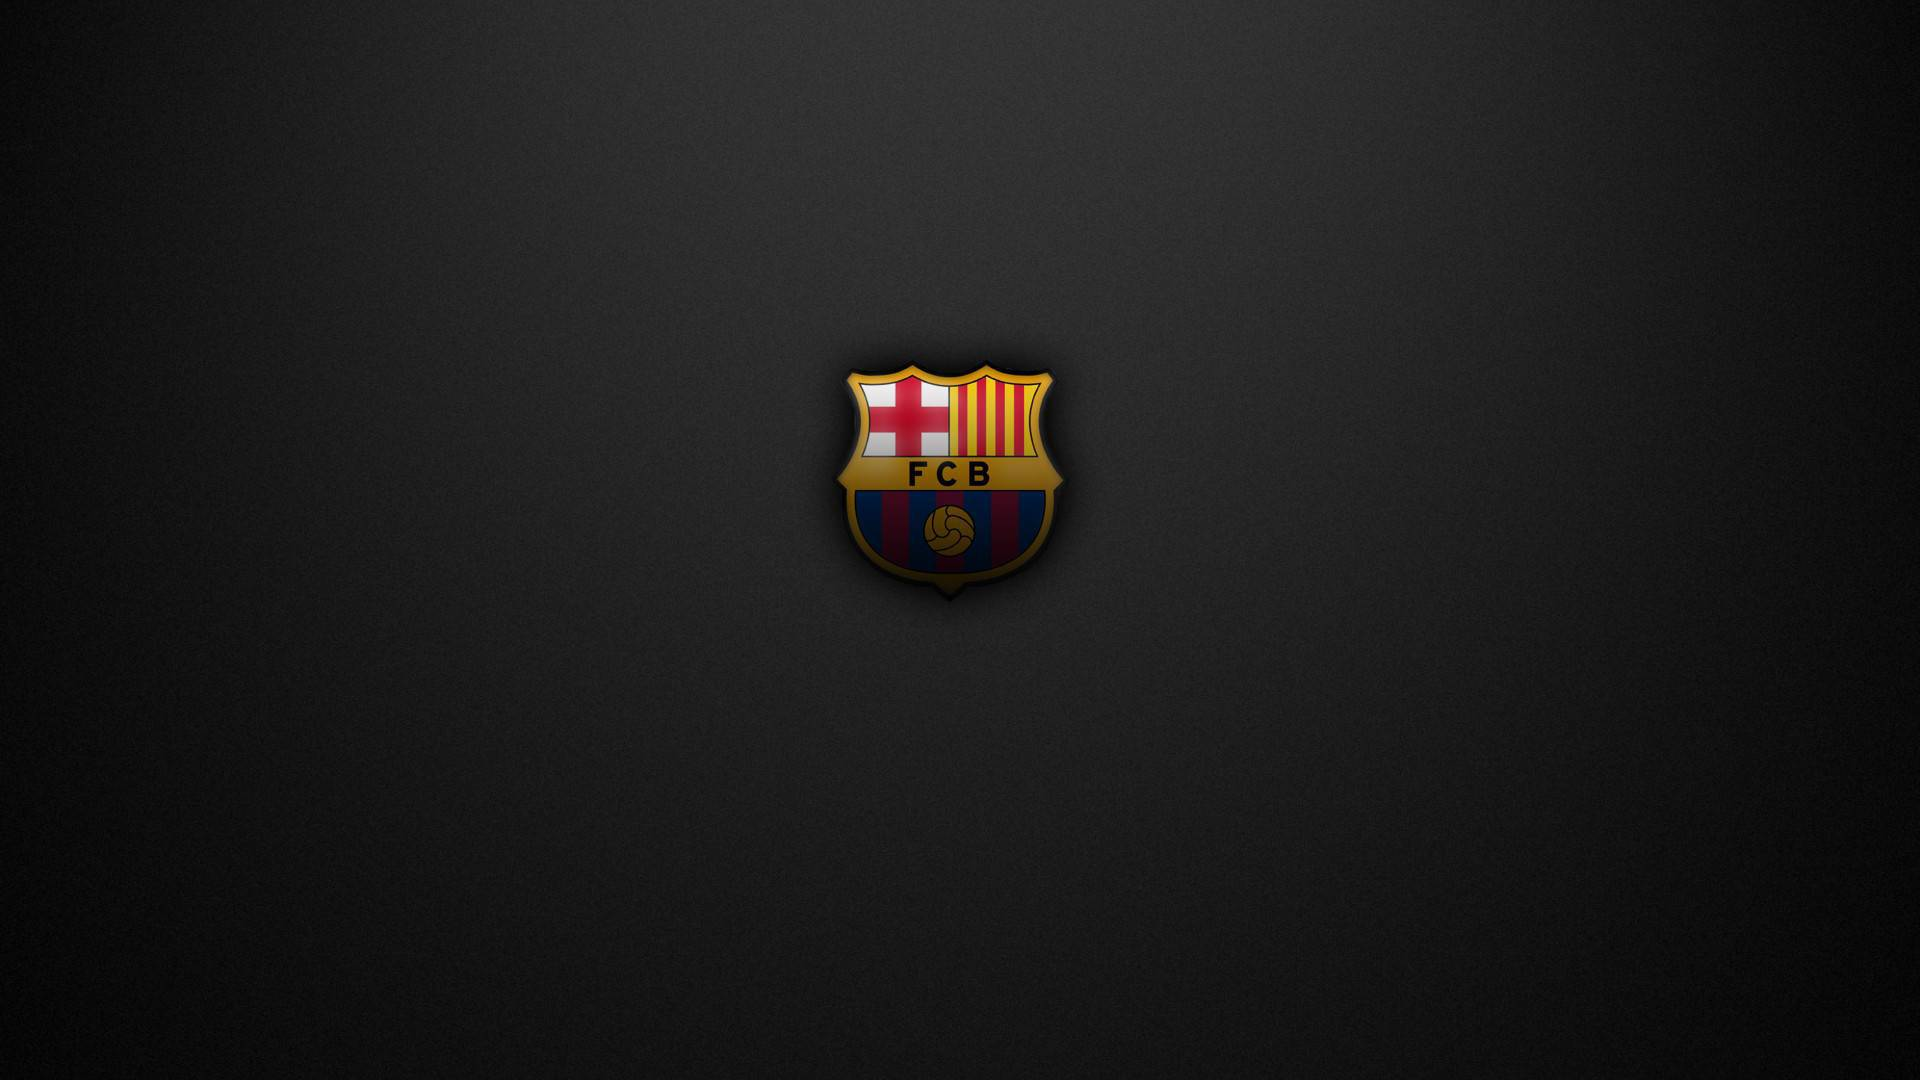 Fondos de pantalla wallpapers gratis barcelona futbol for Fondos de pantalla de futbol para celular